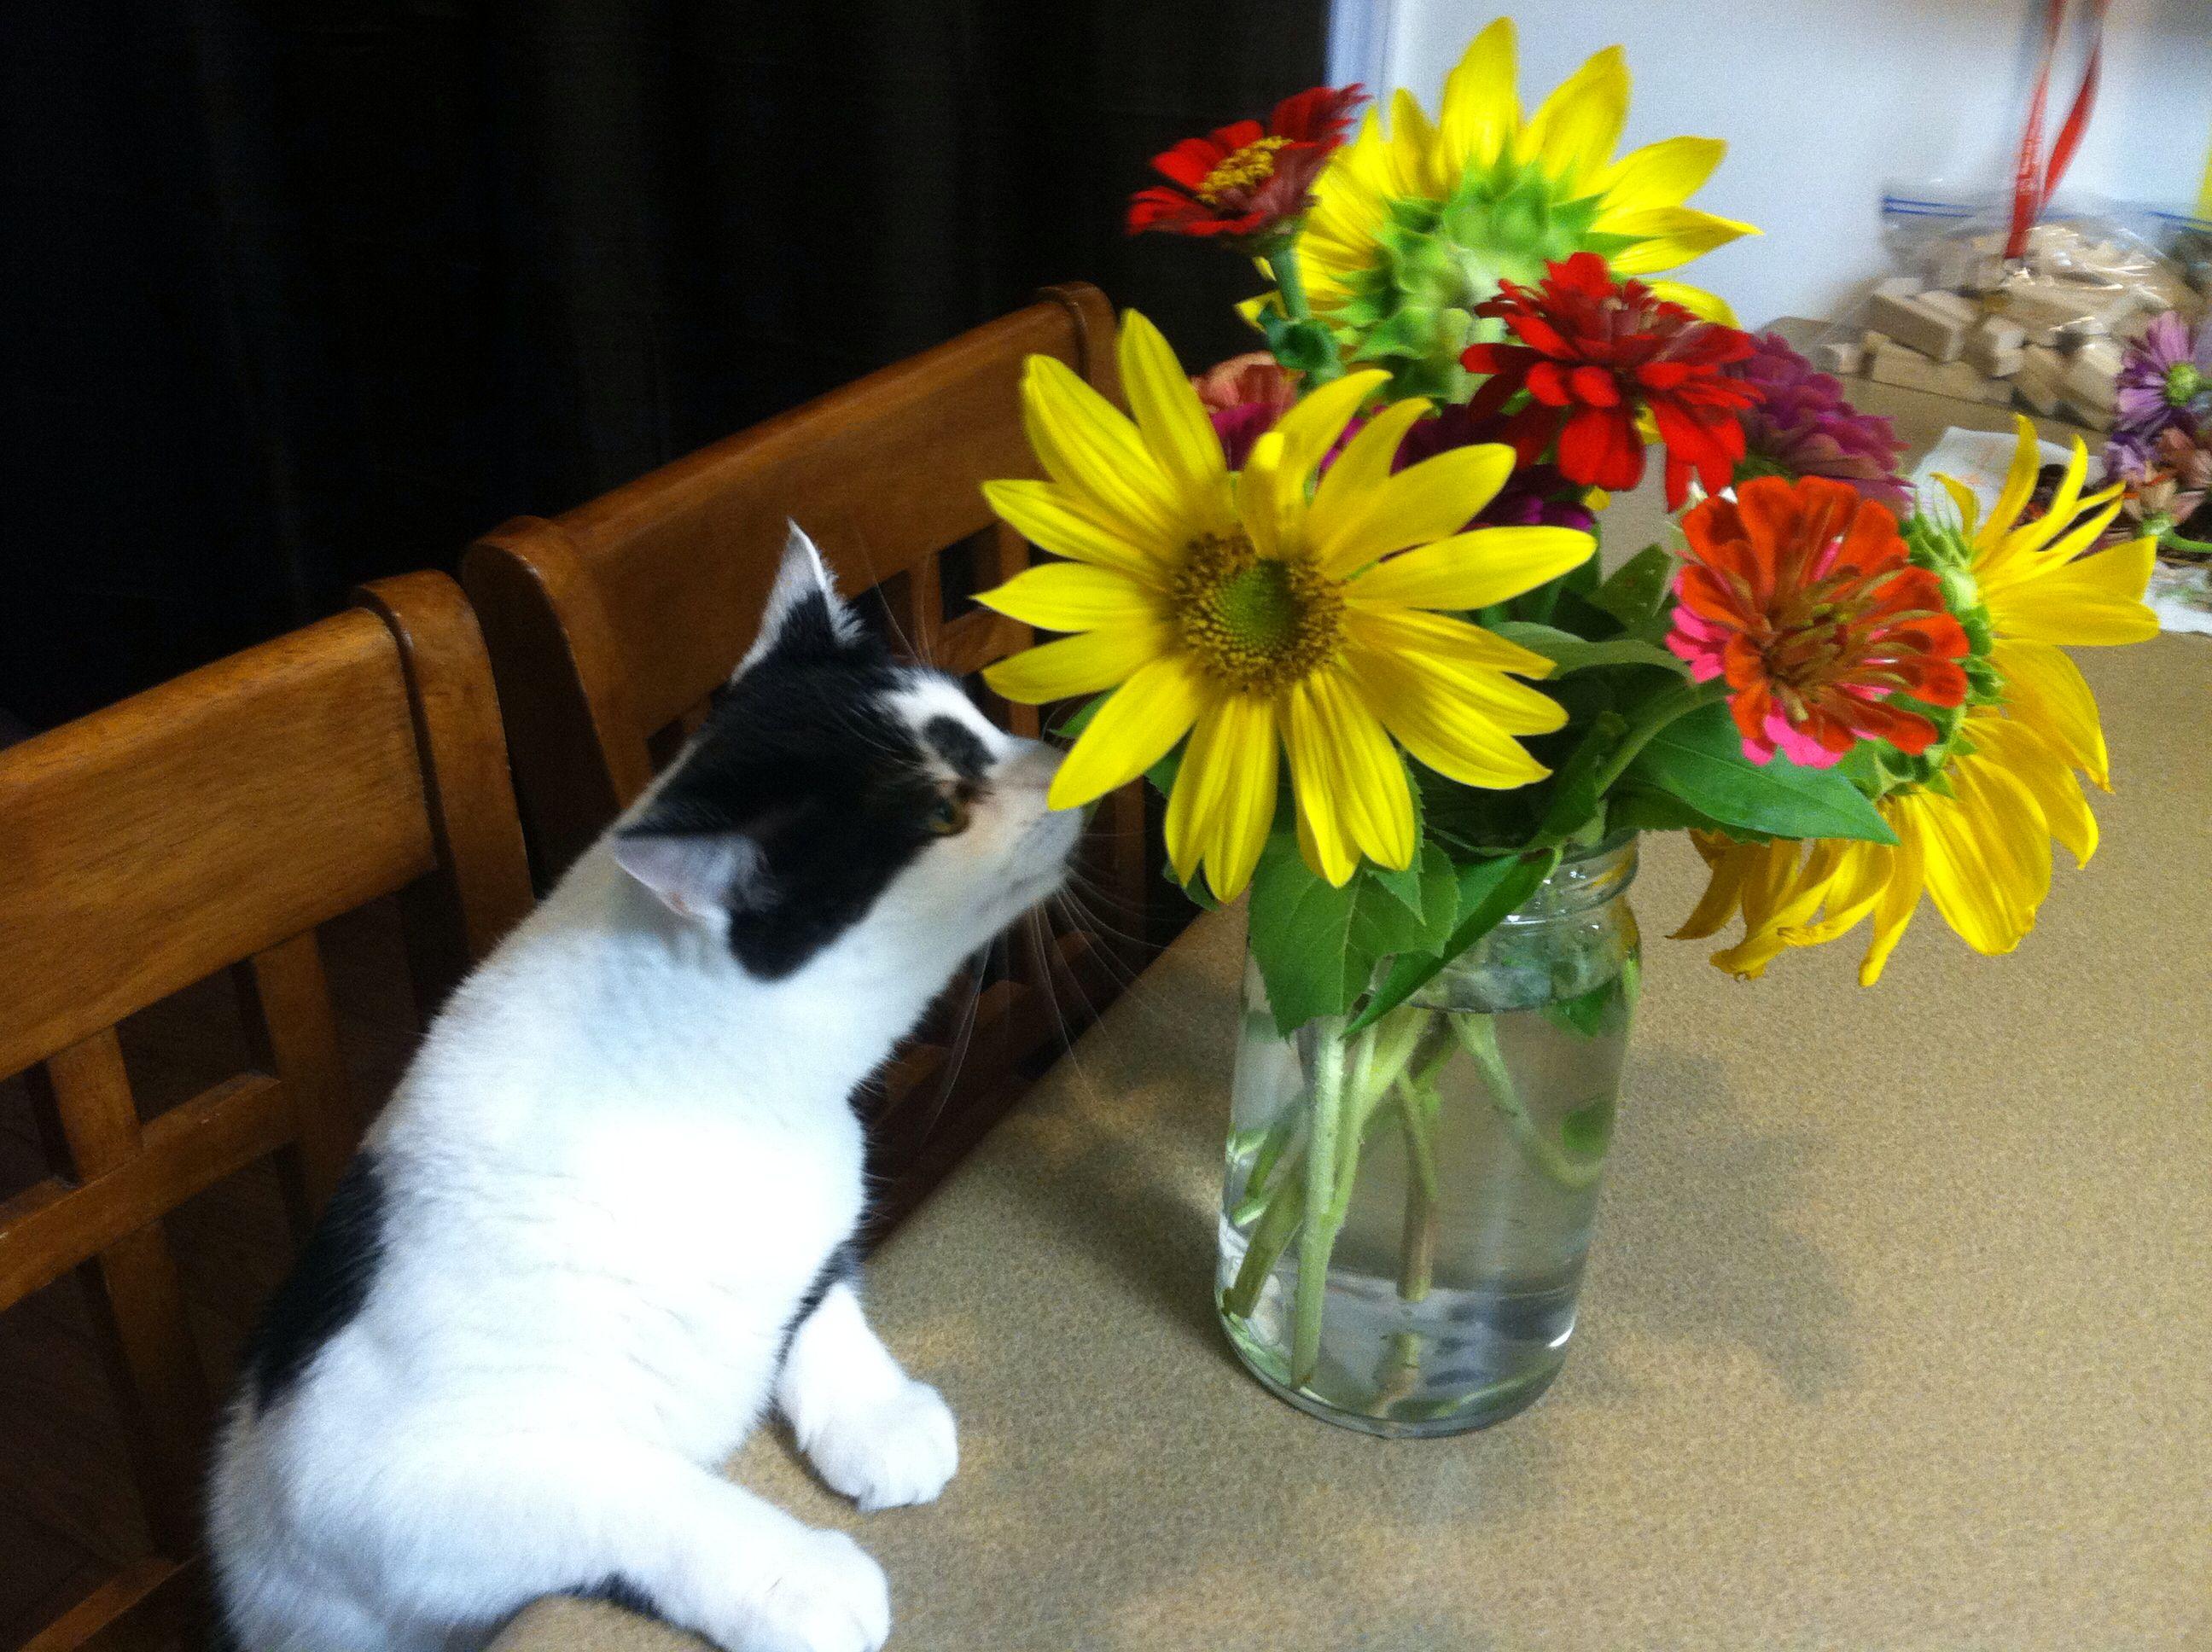 Zinnia loves zinnias and sunflowers!